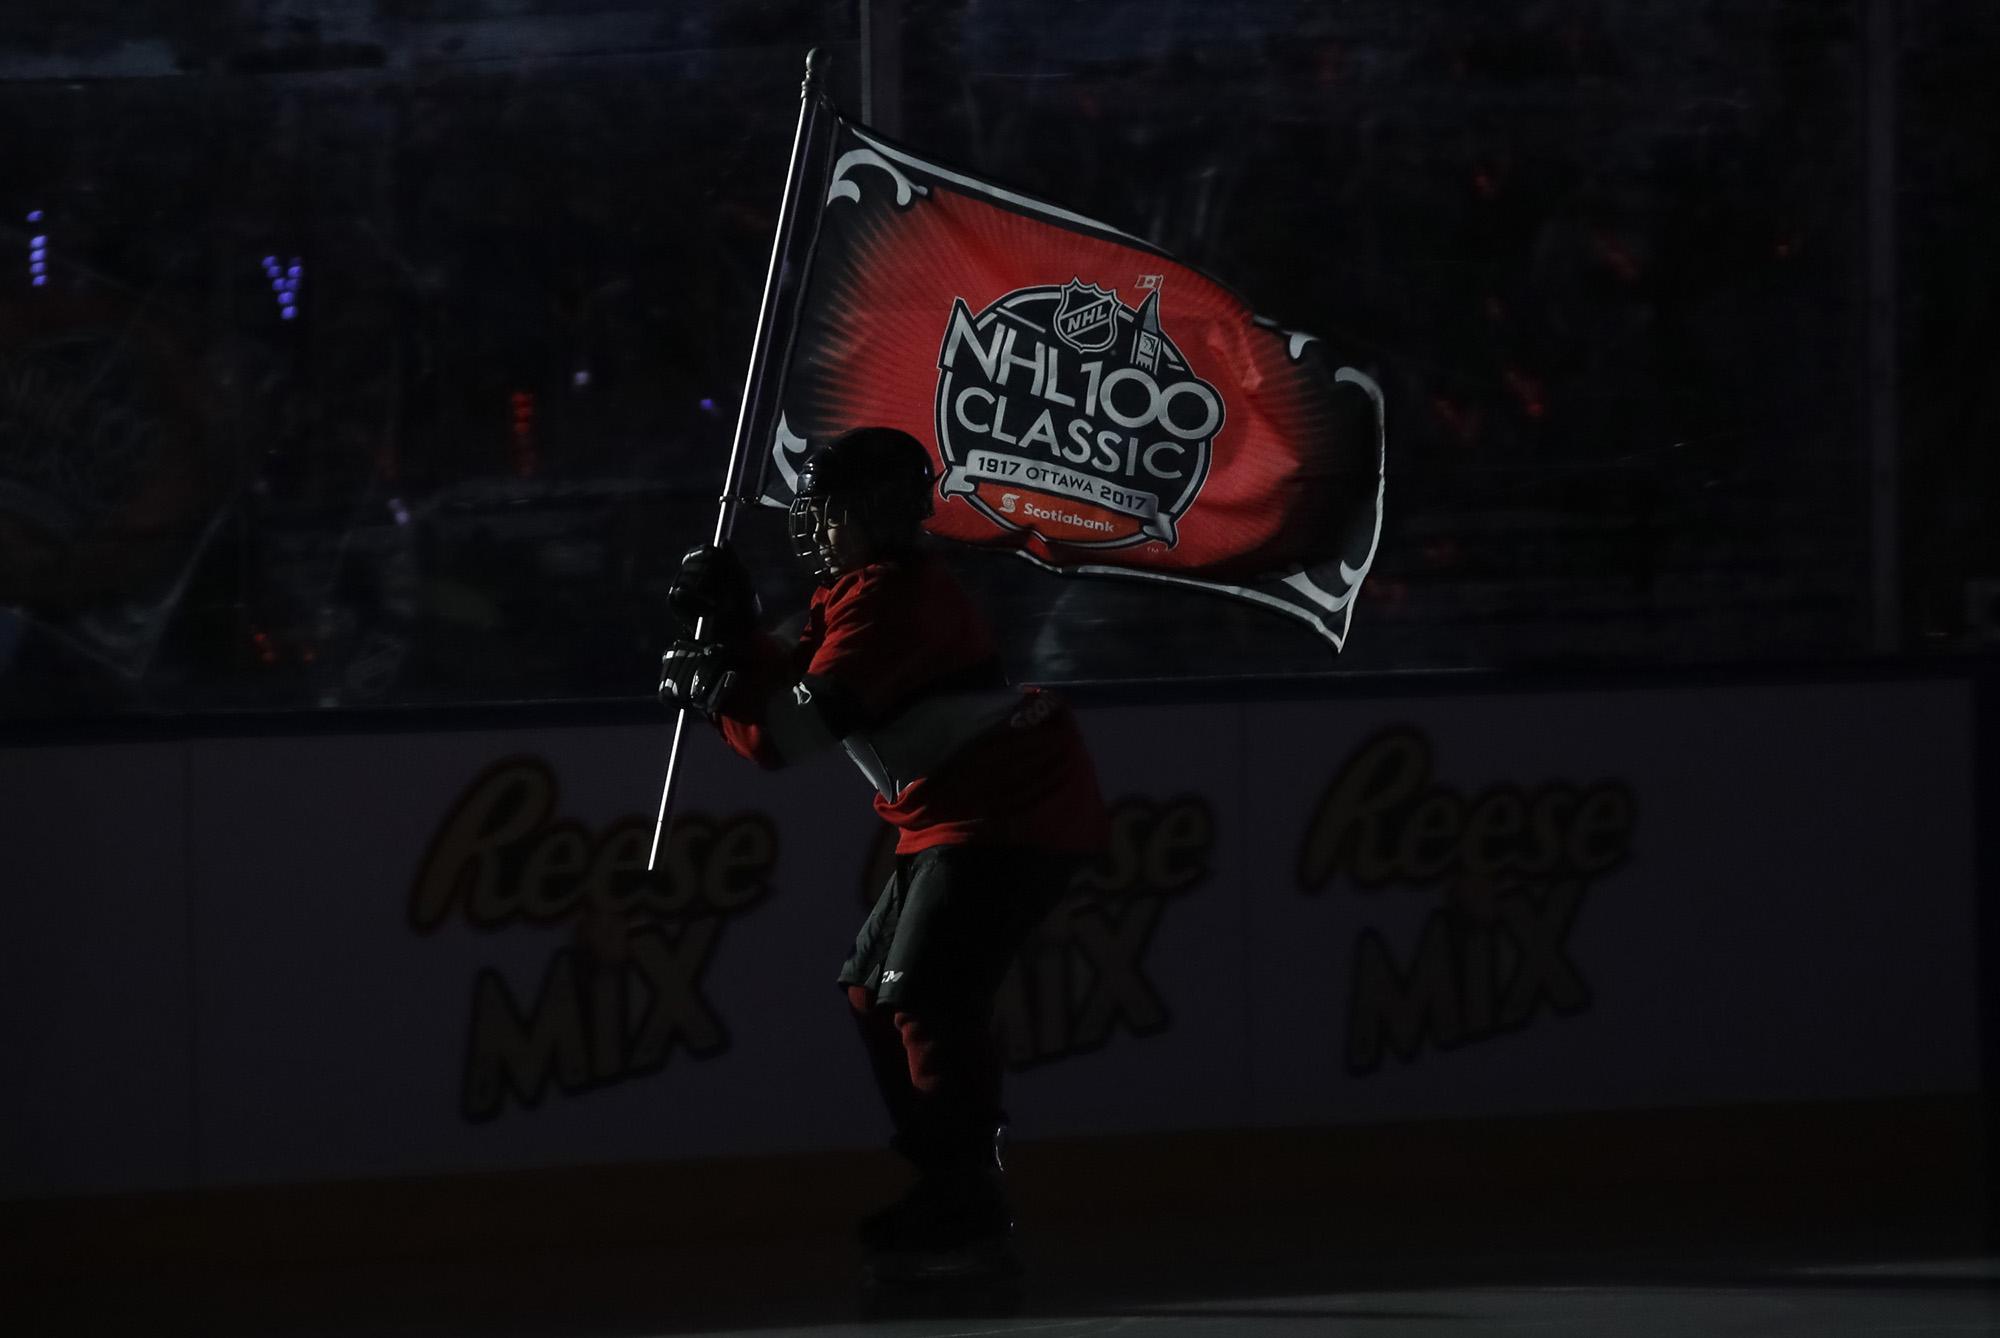 Ottawa_NHL100_Design_10.jpg